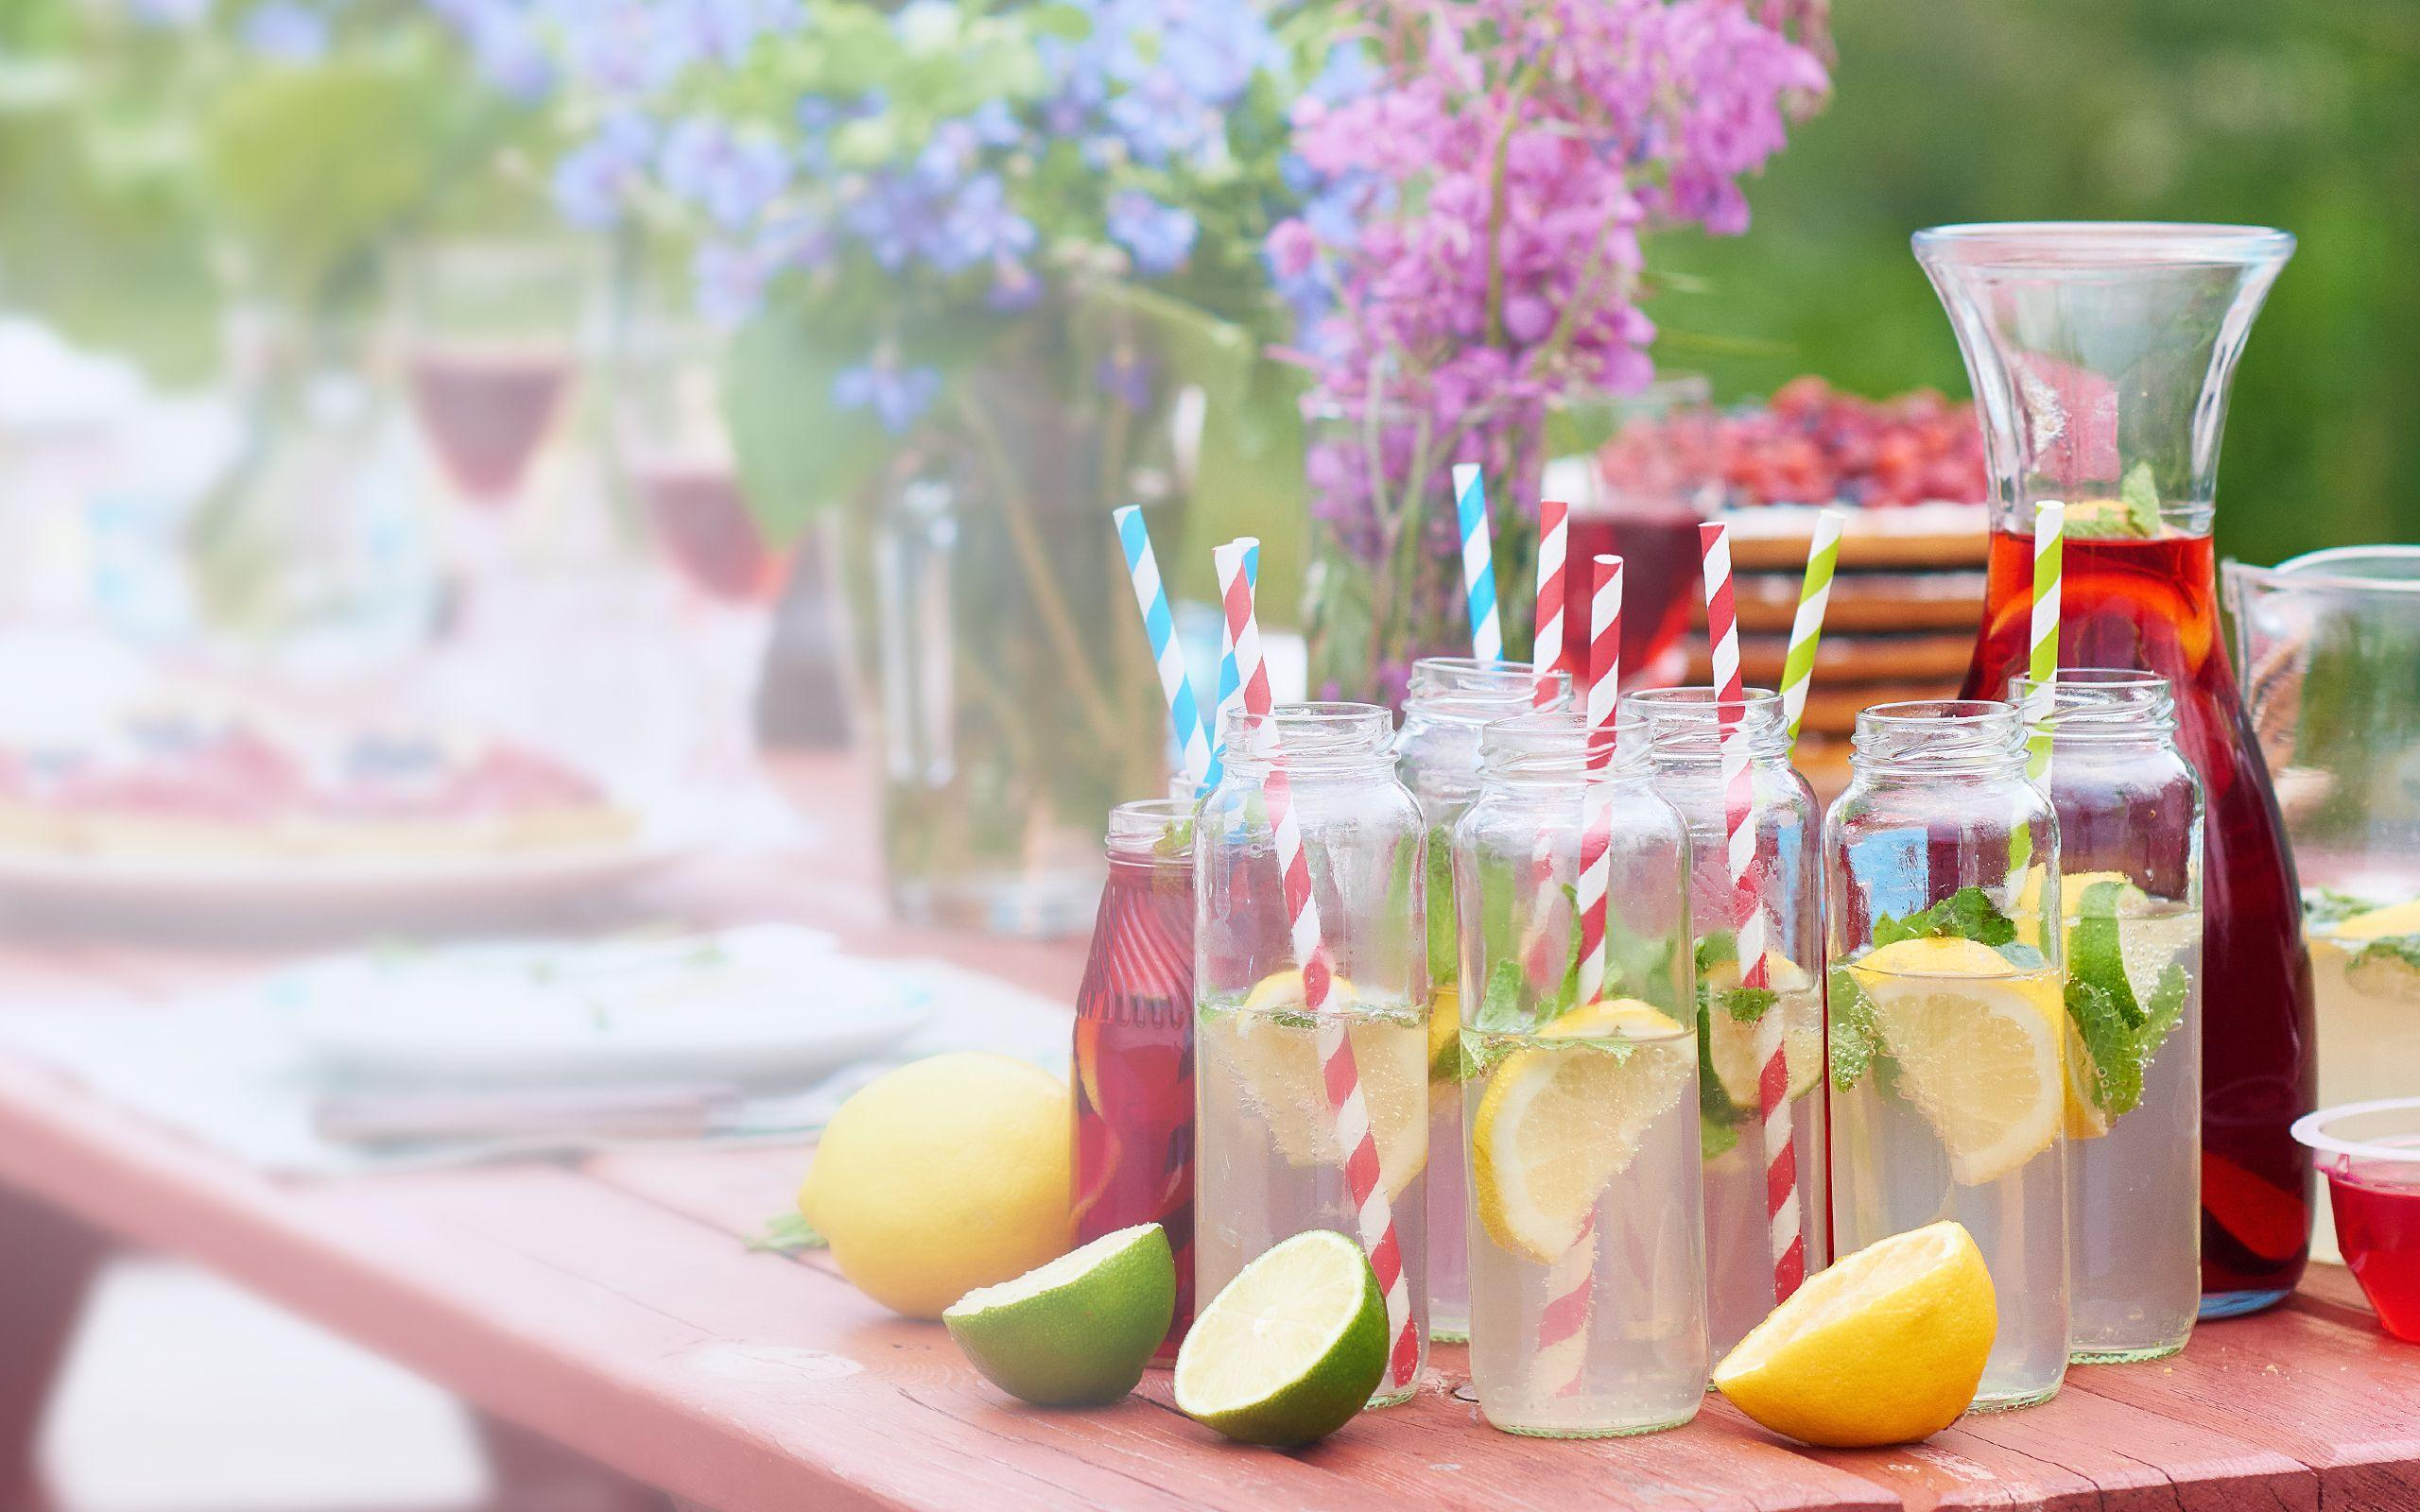 BRITA ice cubes with fruit garden party